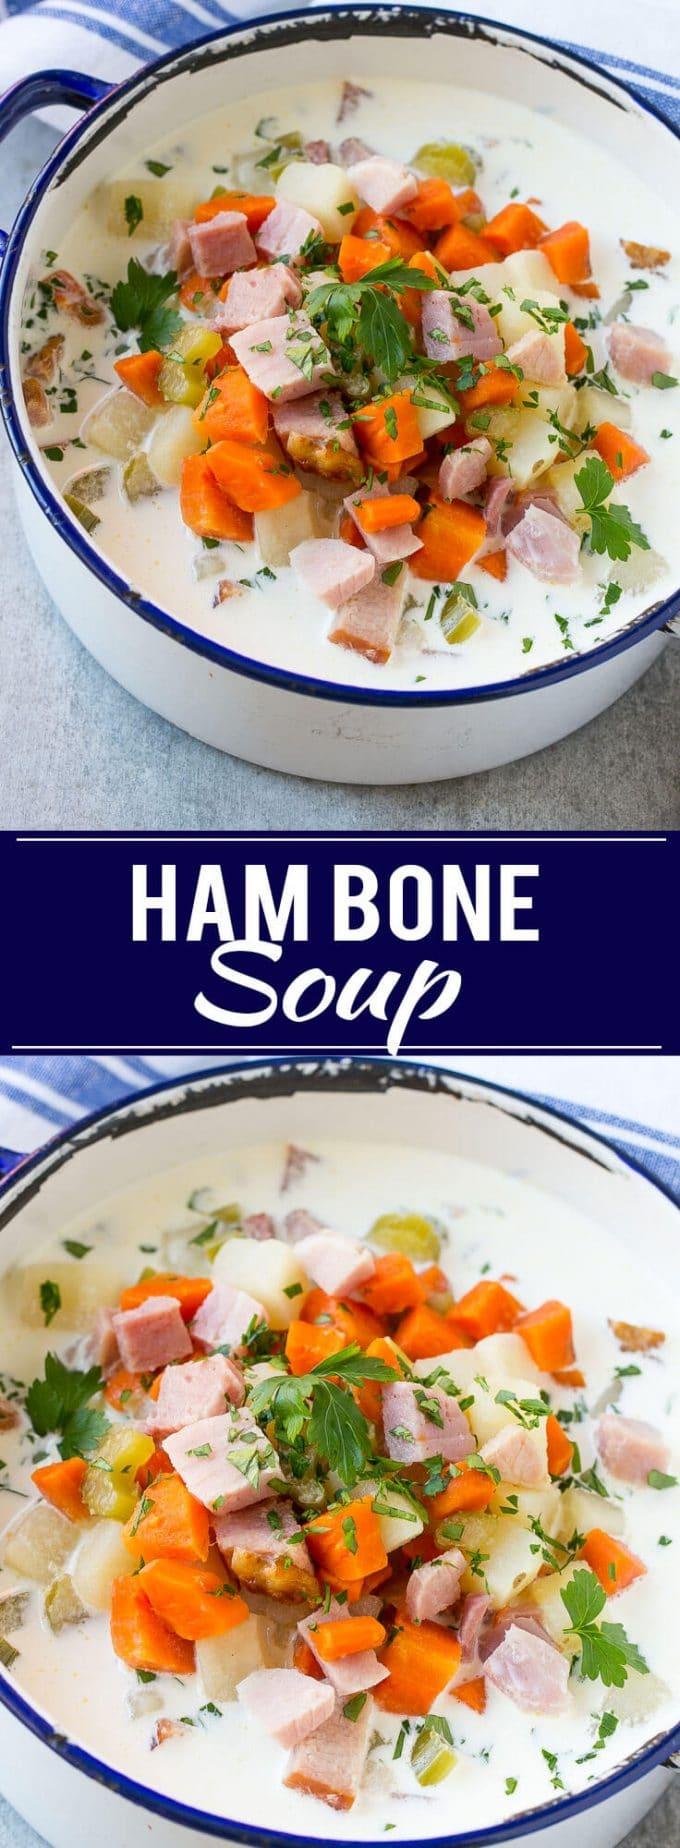 Ham Bone Soup | Ham Soup | Creamy Ham Soup | Soup Recipe | Ham and Potato Soup | Easy Soup